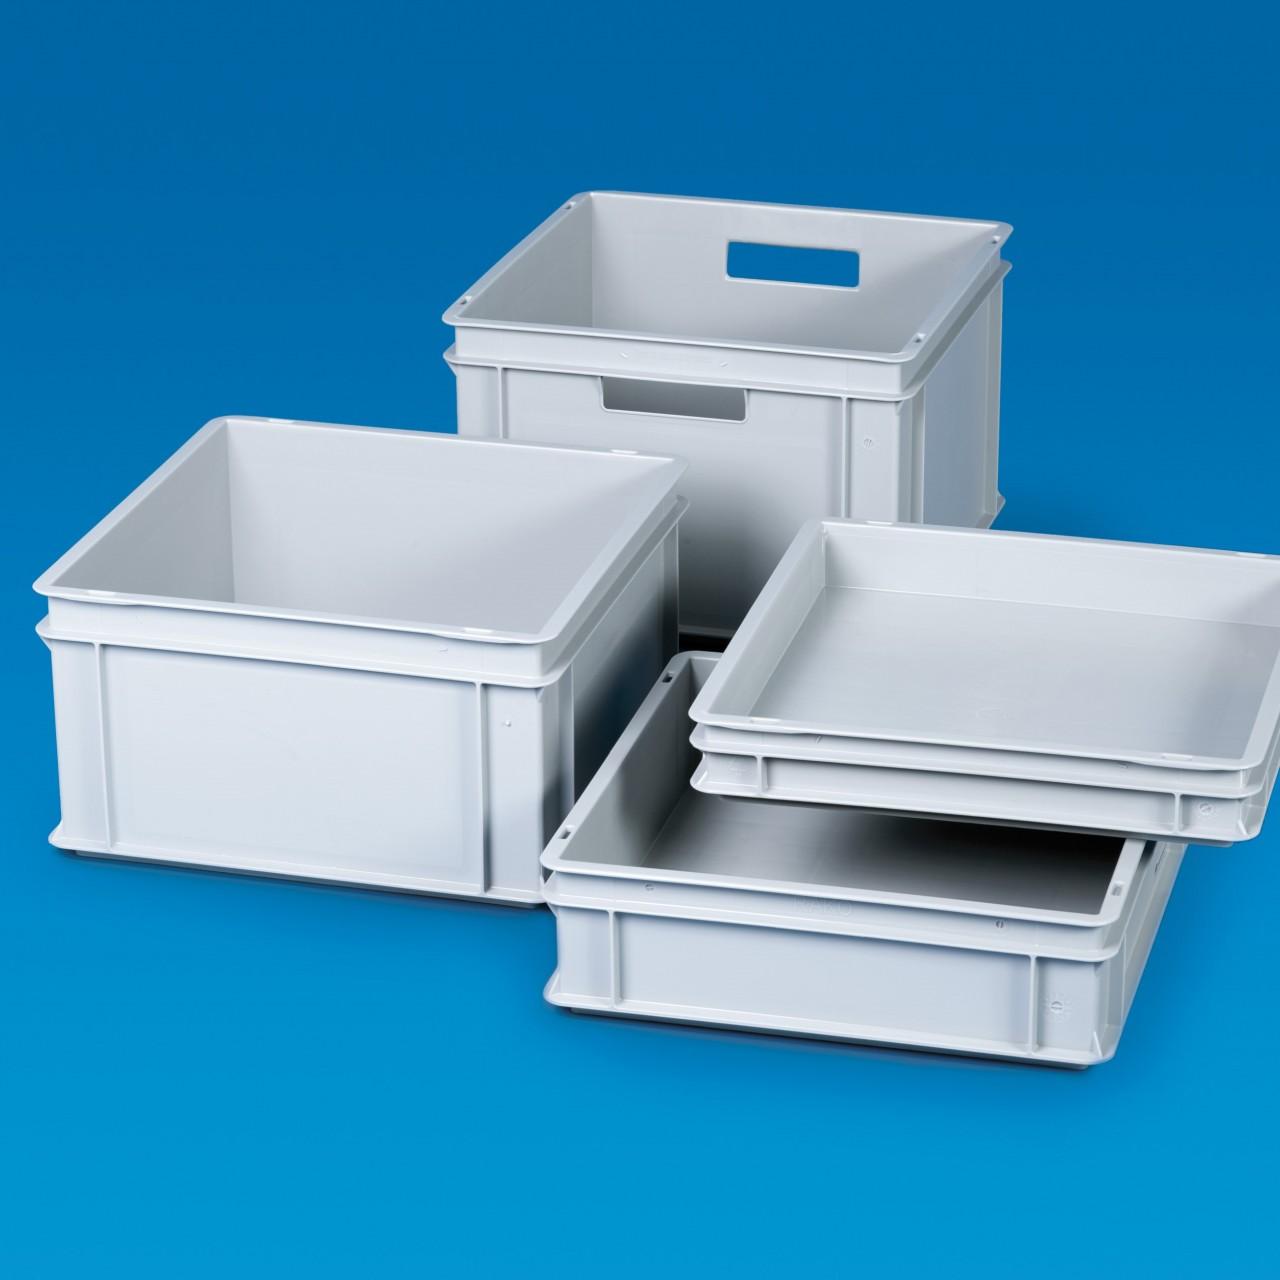 Rako-Behälter |Grundfläche 400 x 400 mm